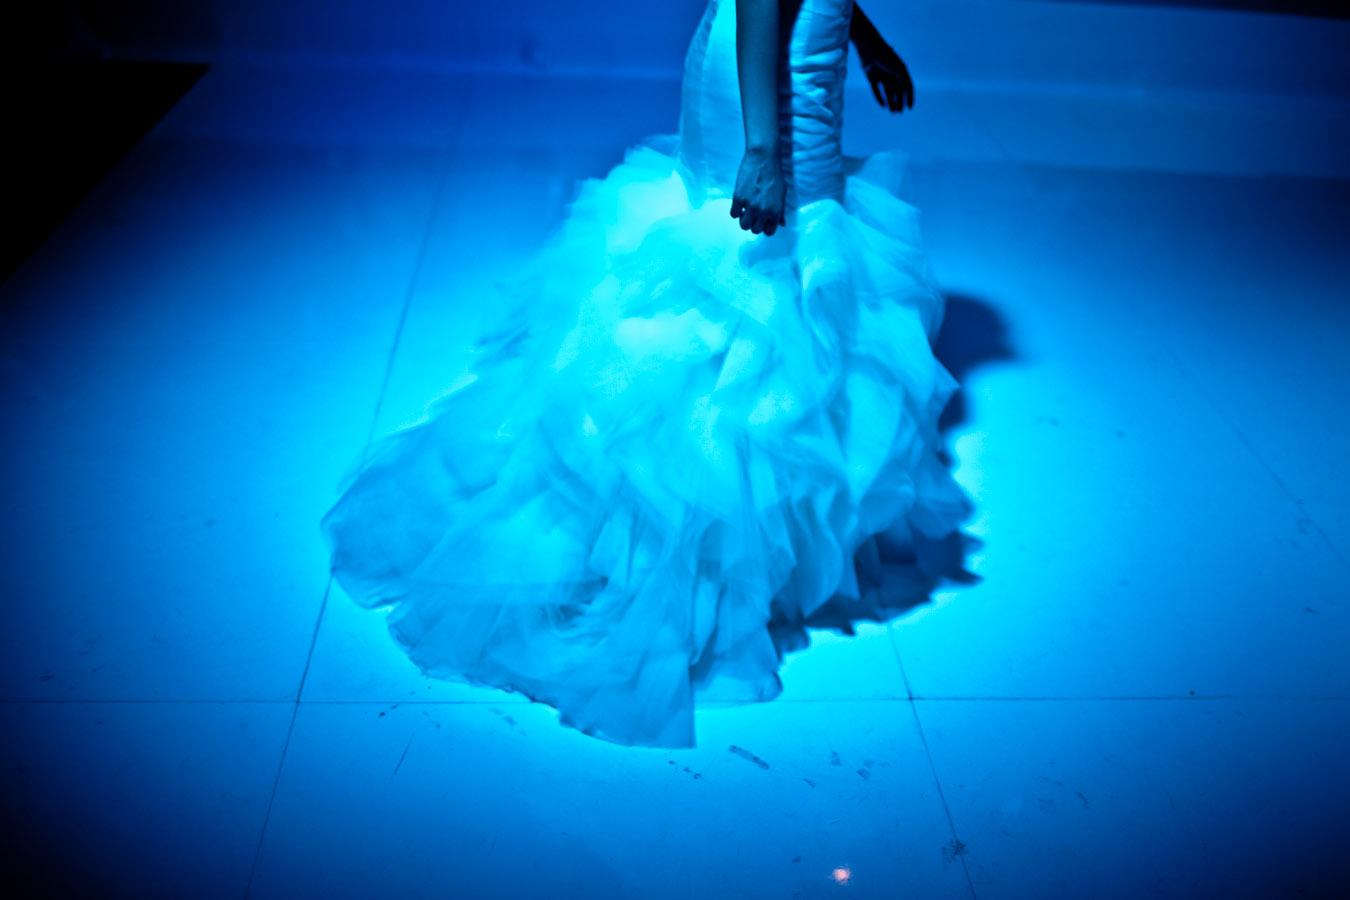 Arlene_LA_Wedding_Photographer-31